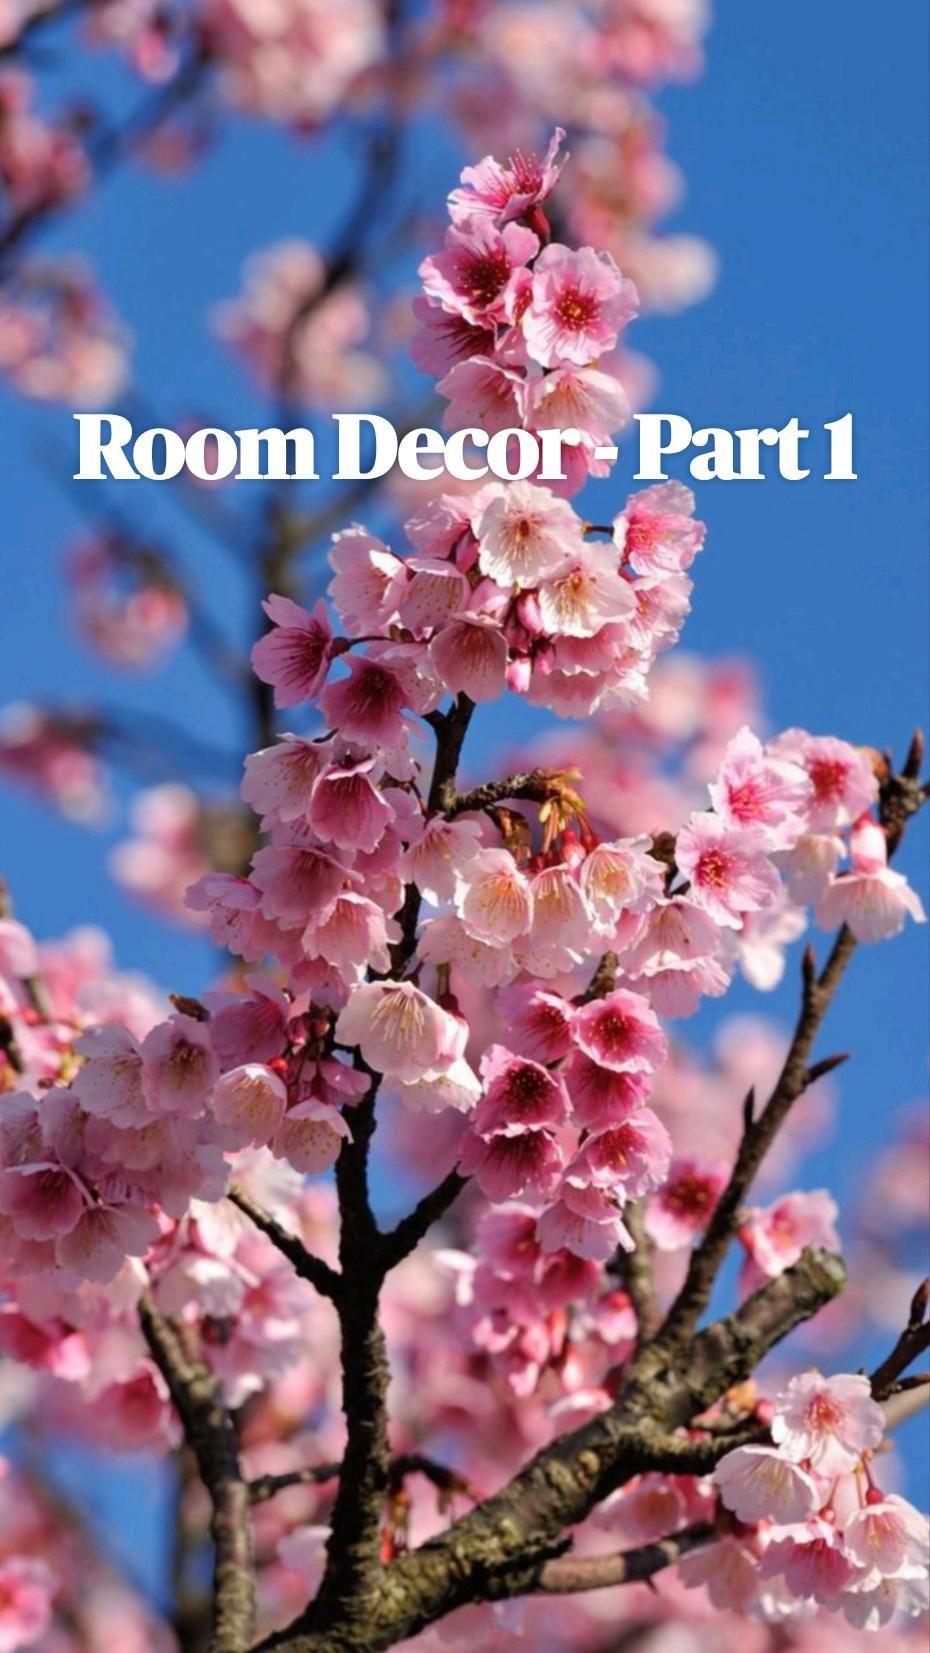 Room Decor - Part 1